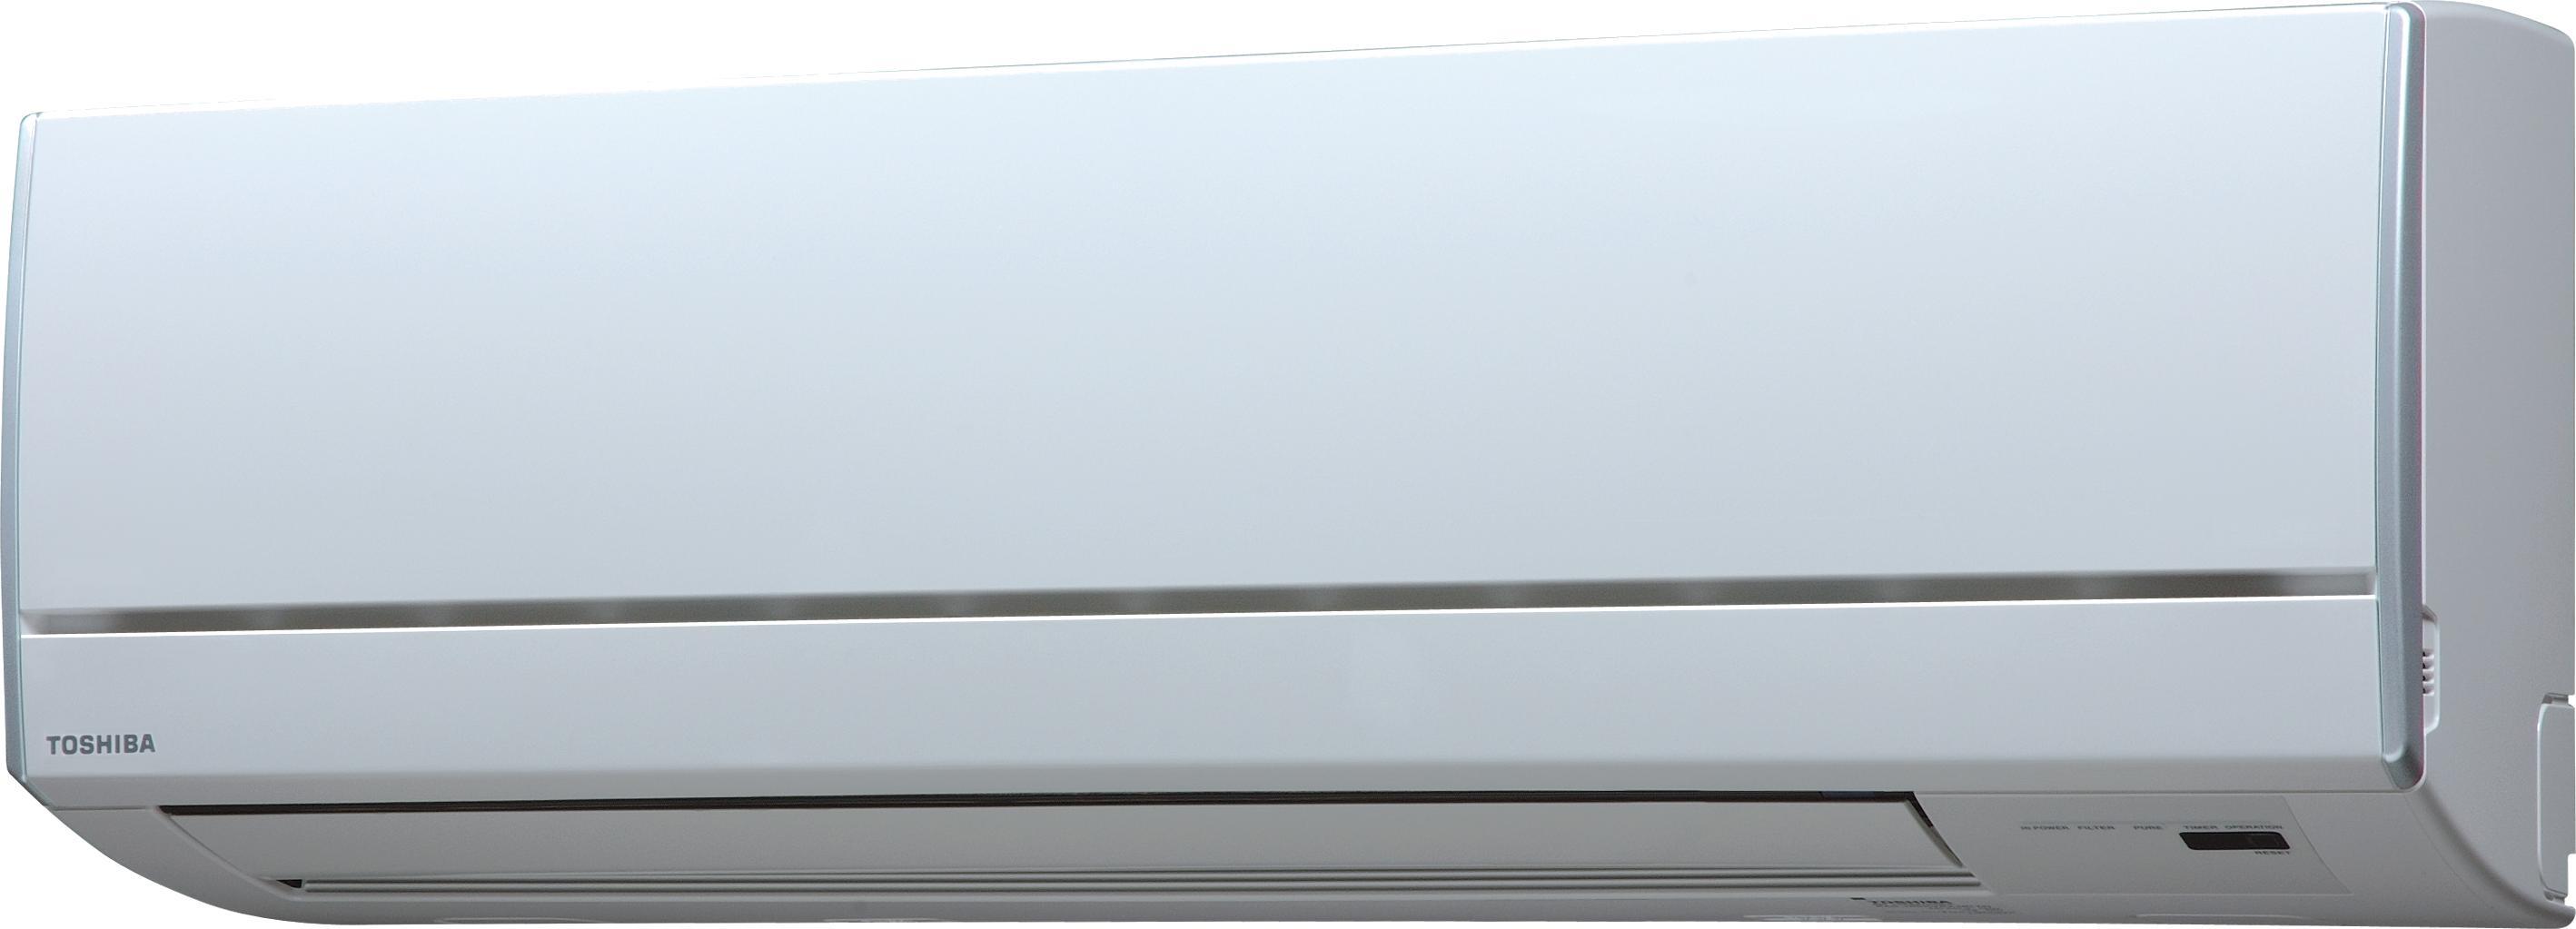 Toshiba RAS-18SA-ES